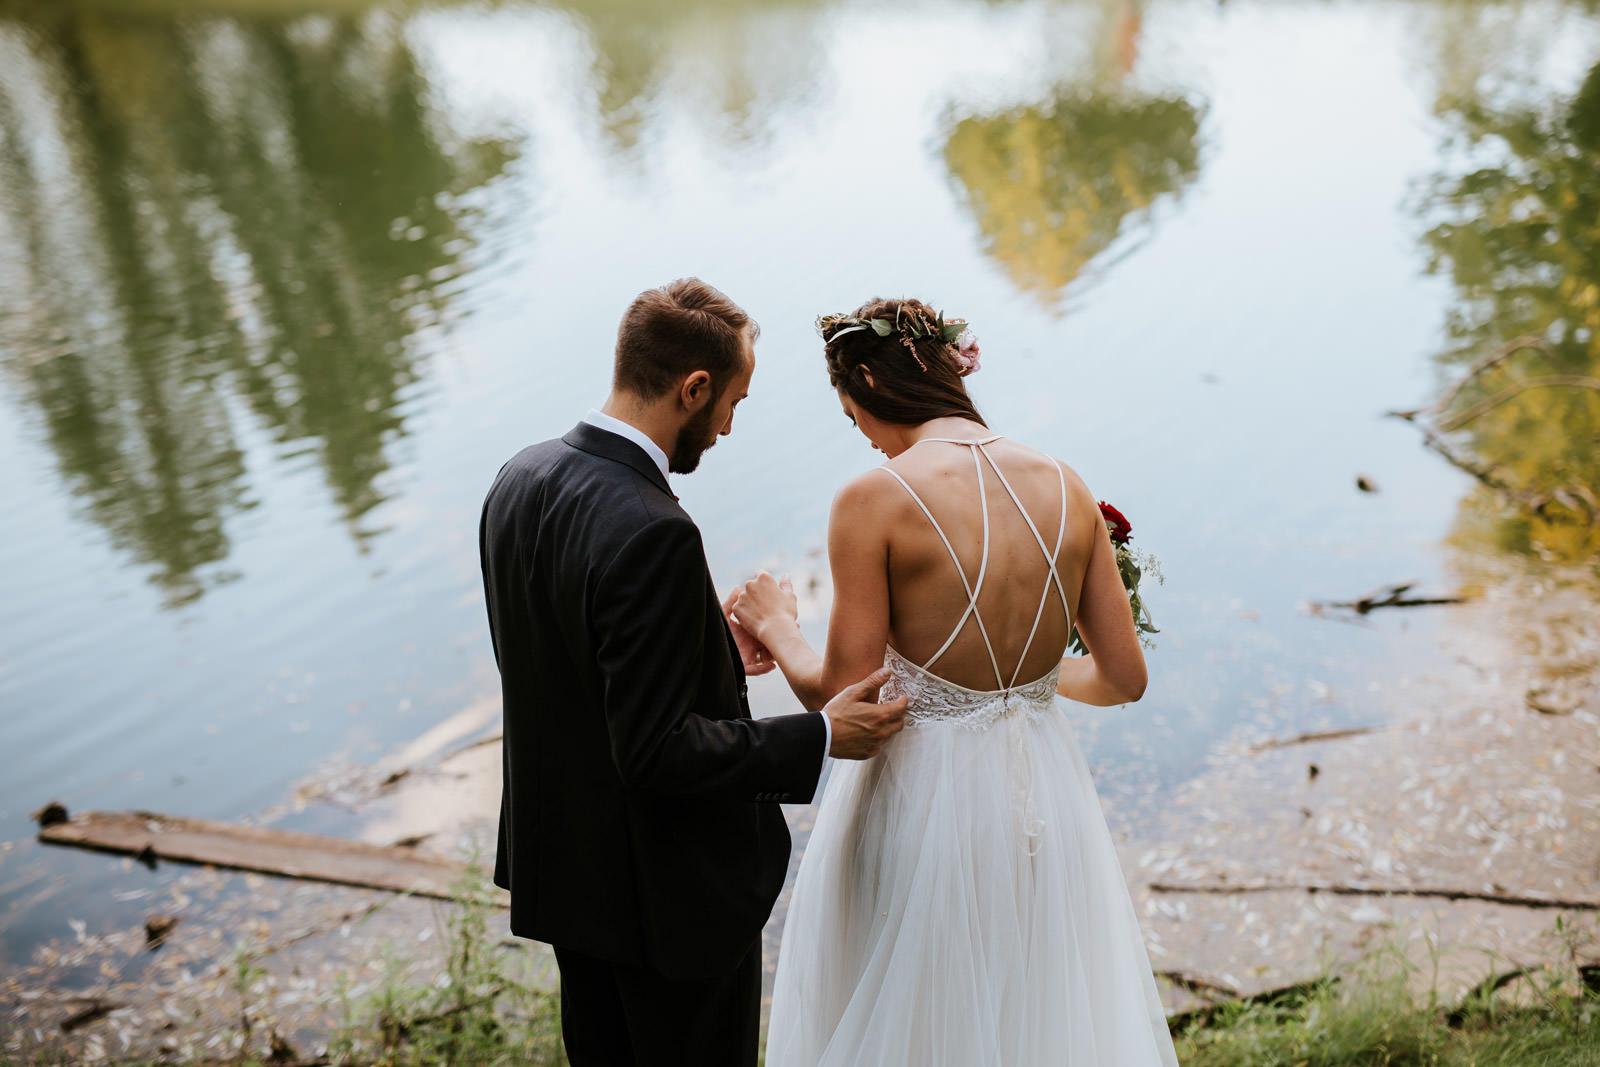 Outdoor destination wedding photographer